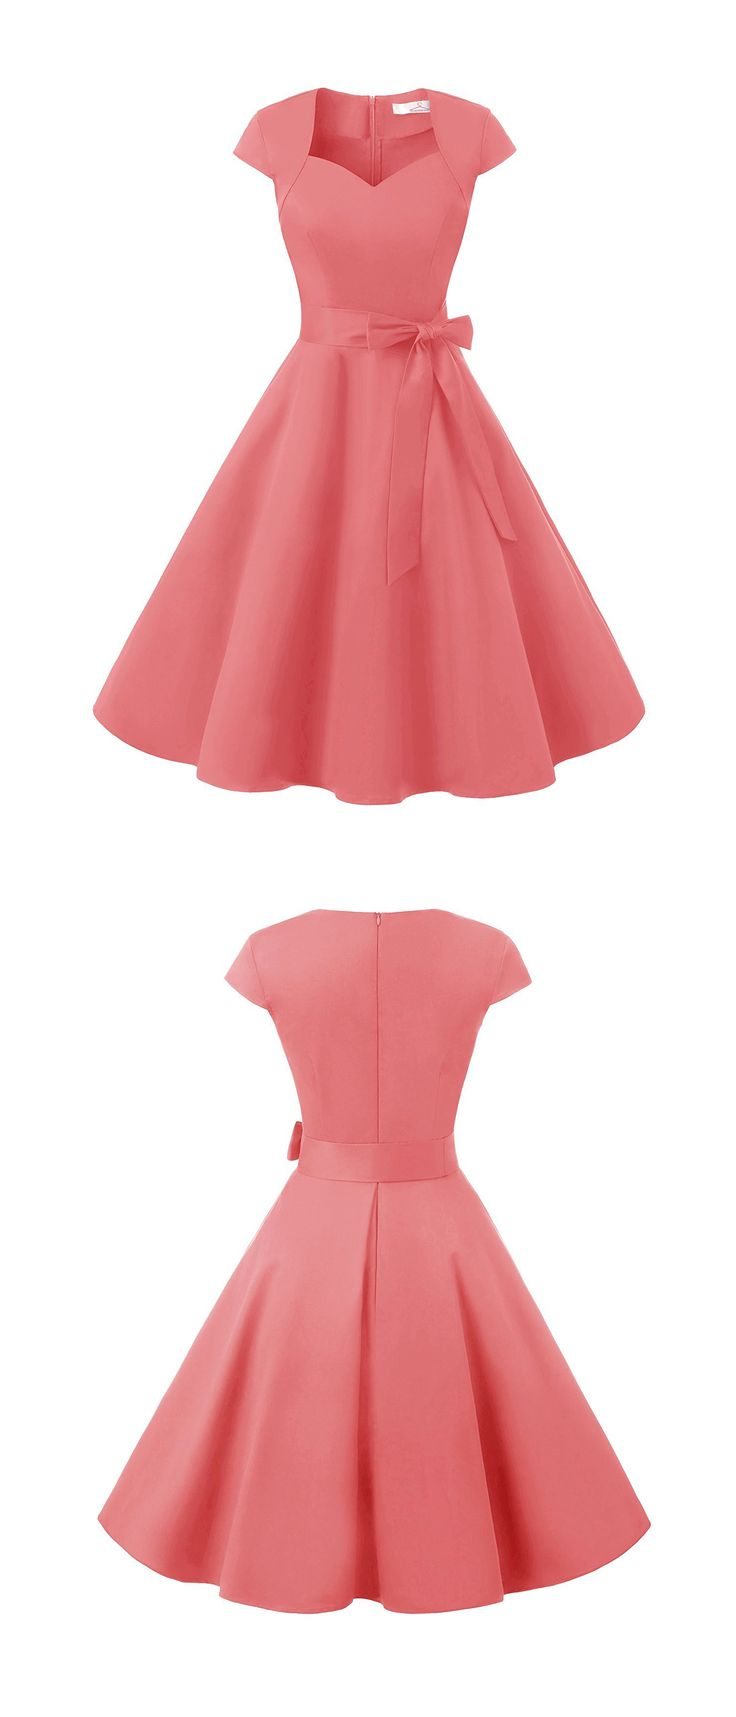 vintage dresses,50s dresses,retro dresses,rockabilly dresses,pink dresses,